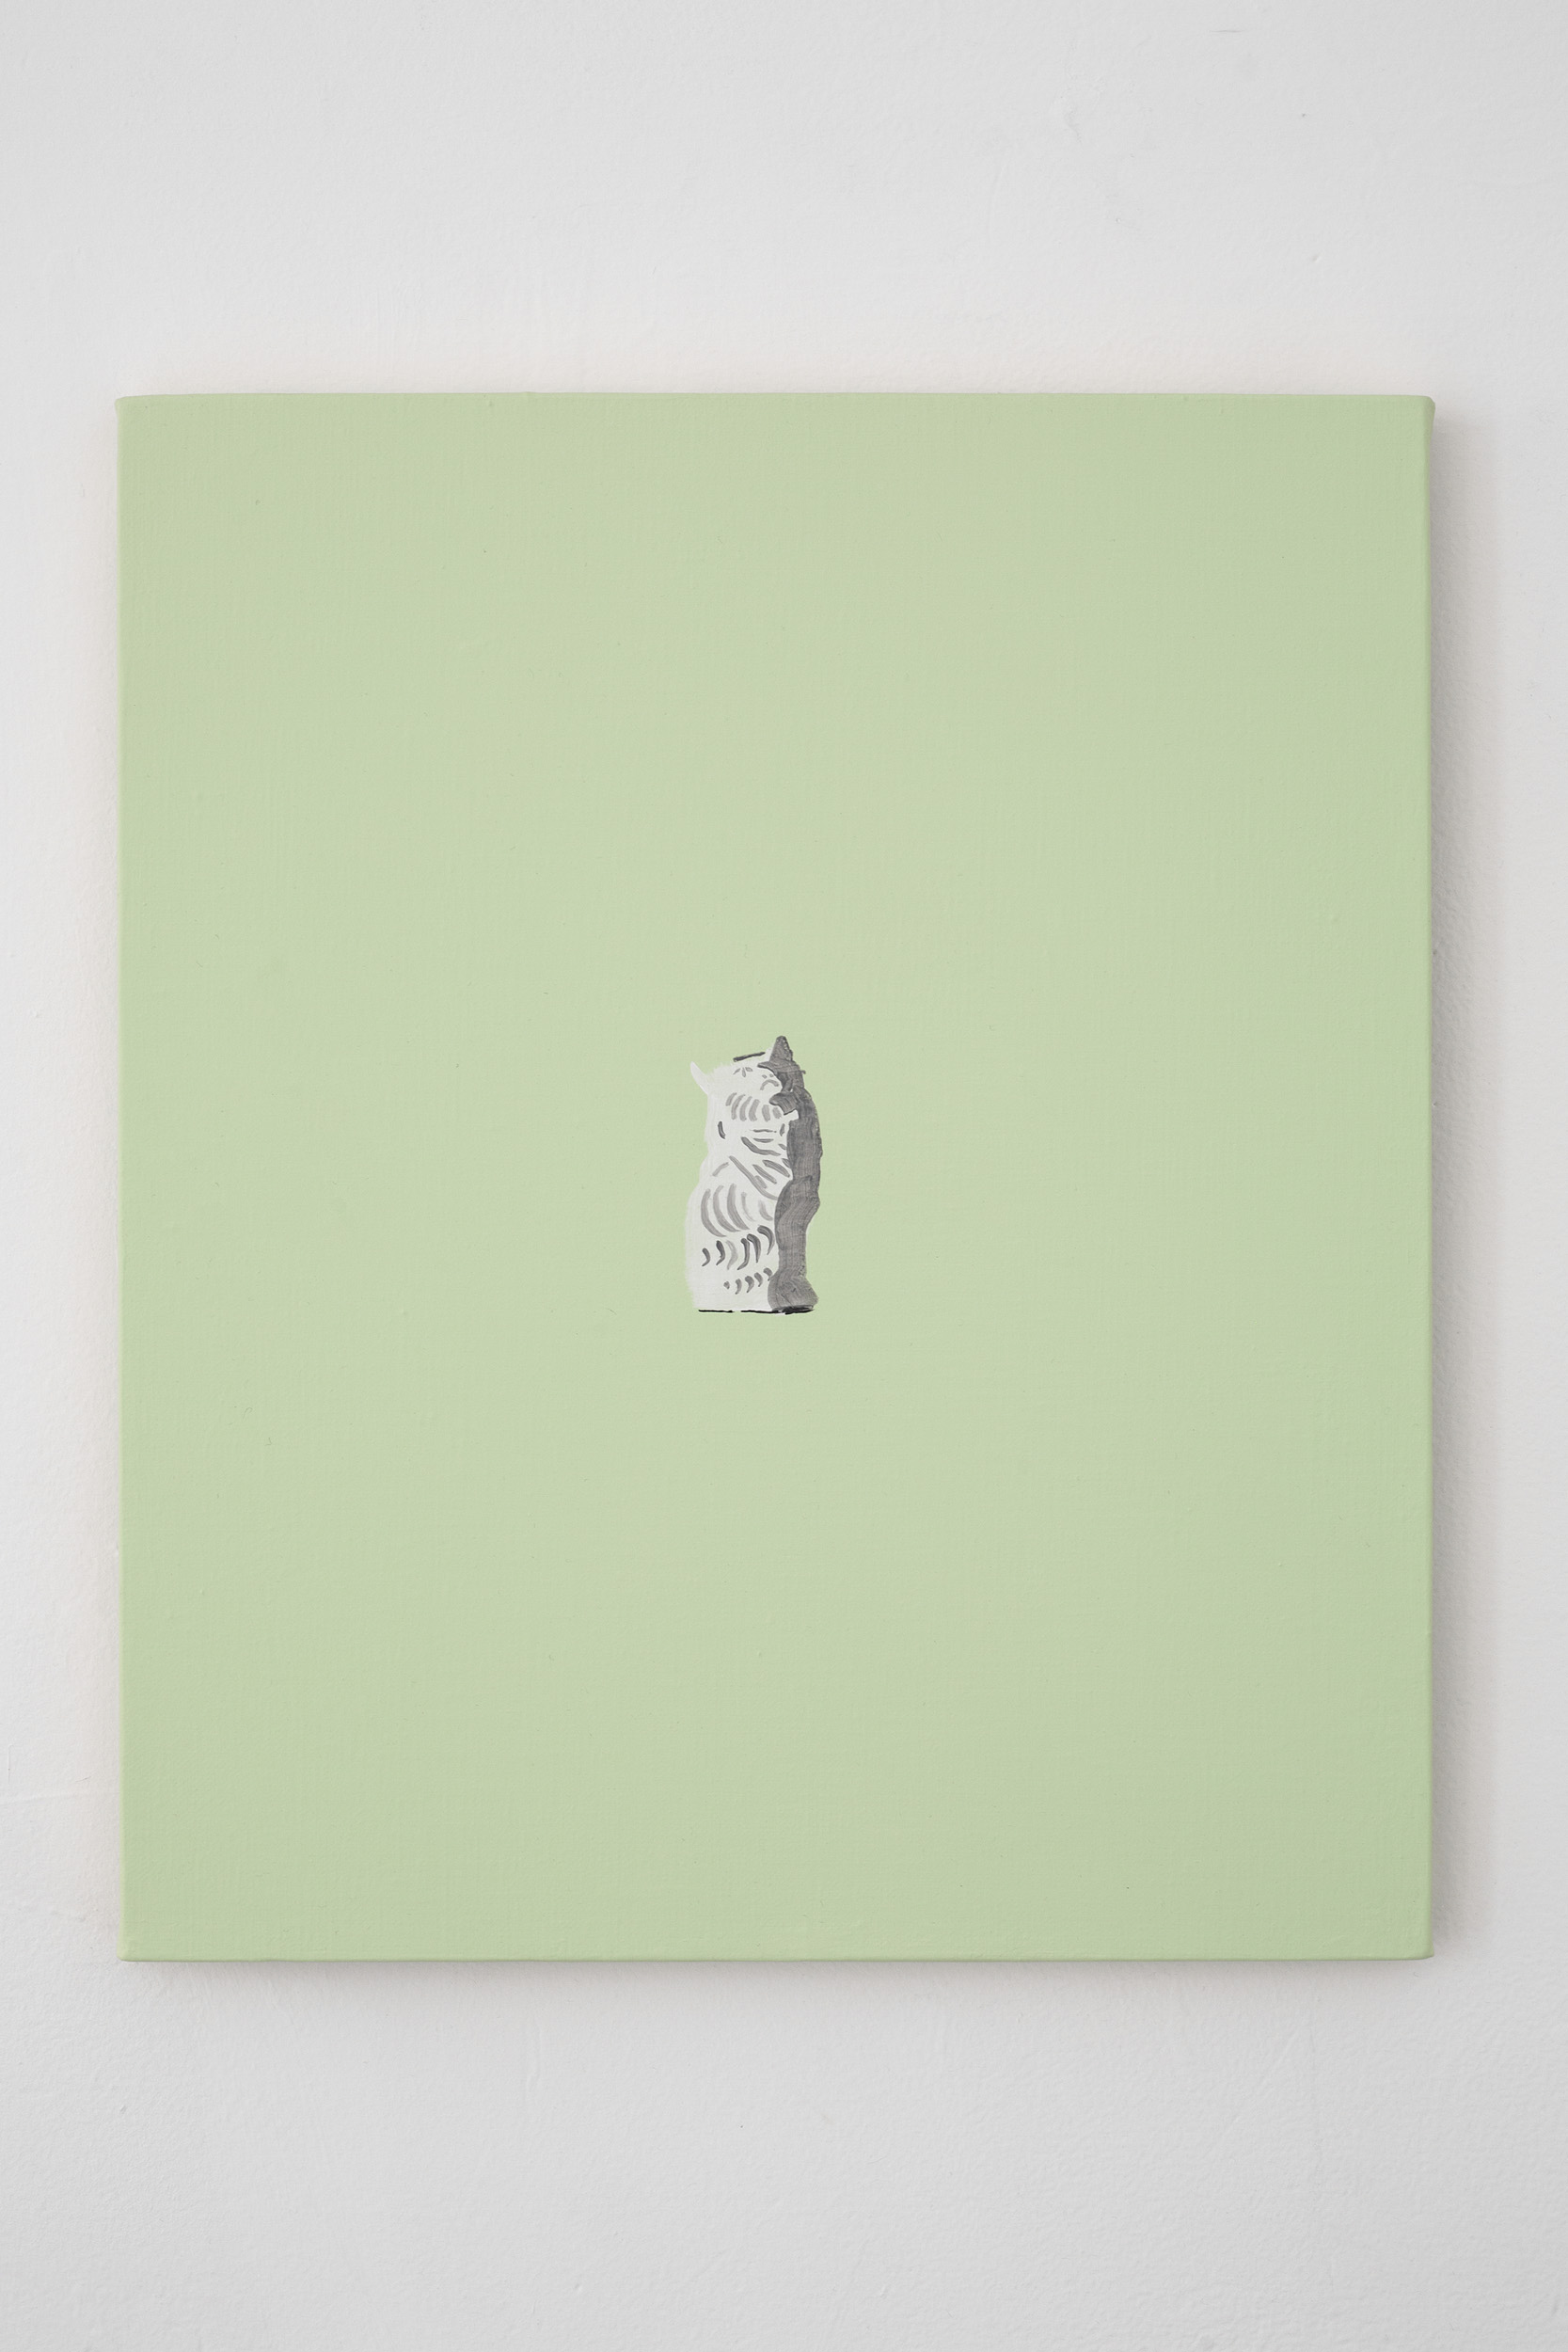 Shimon Minamikawa  (Various) Cat (Figurines),  2019. Acrylic on canvas, 45.6 x 38 cm